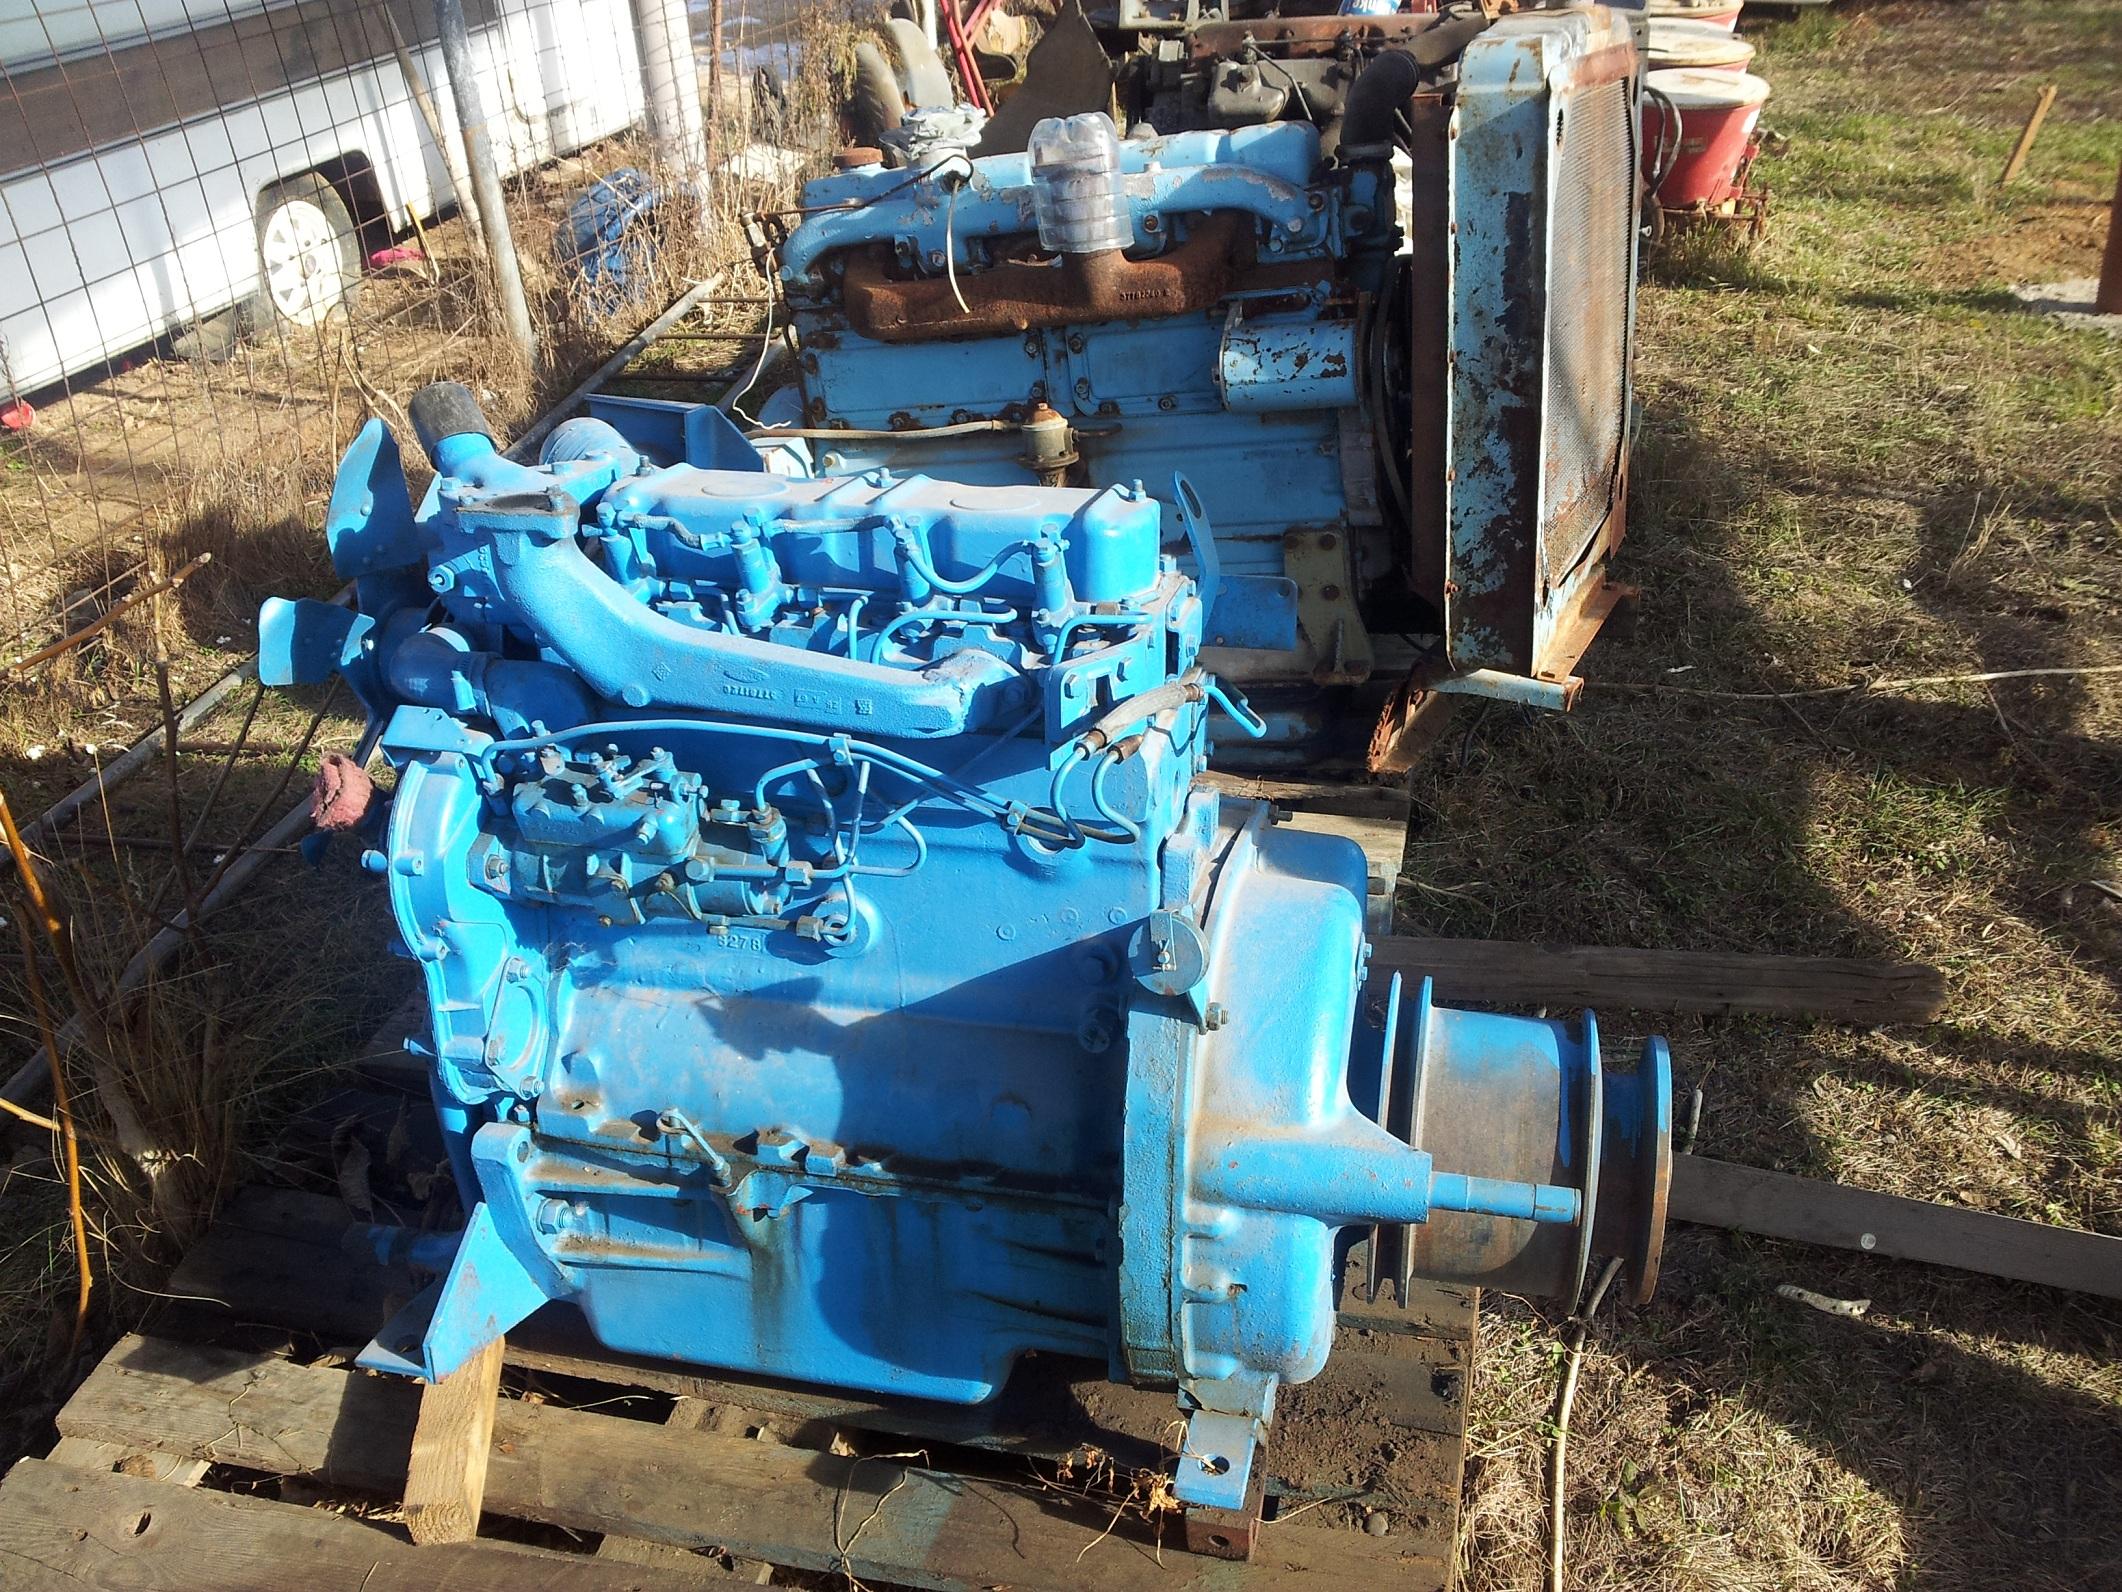 Motor perkins 4236 combina sau tractor